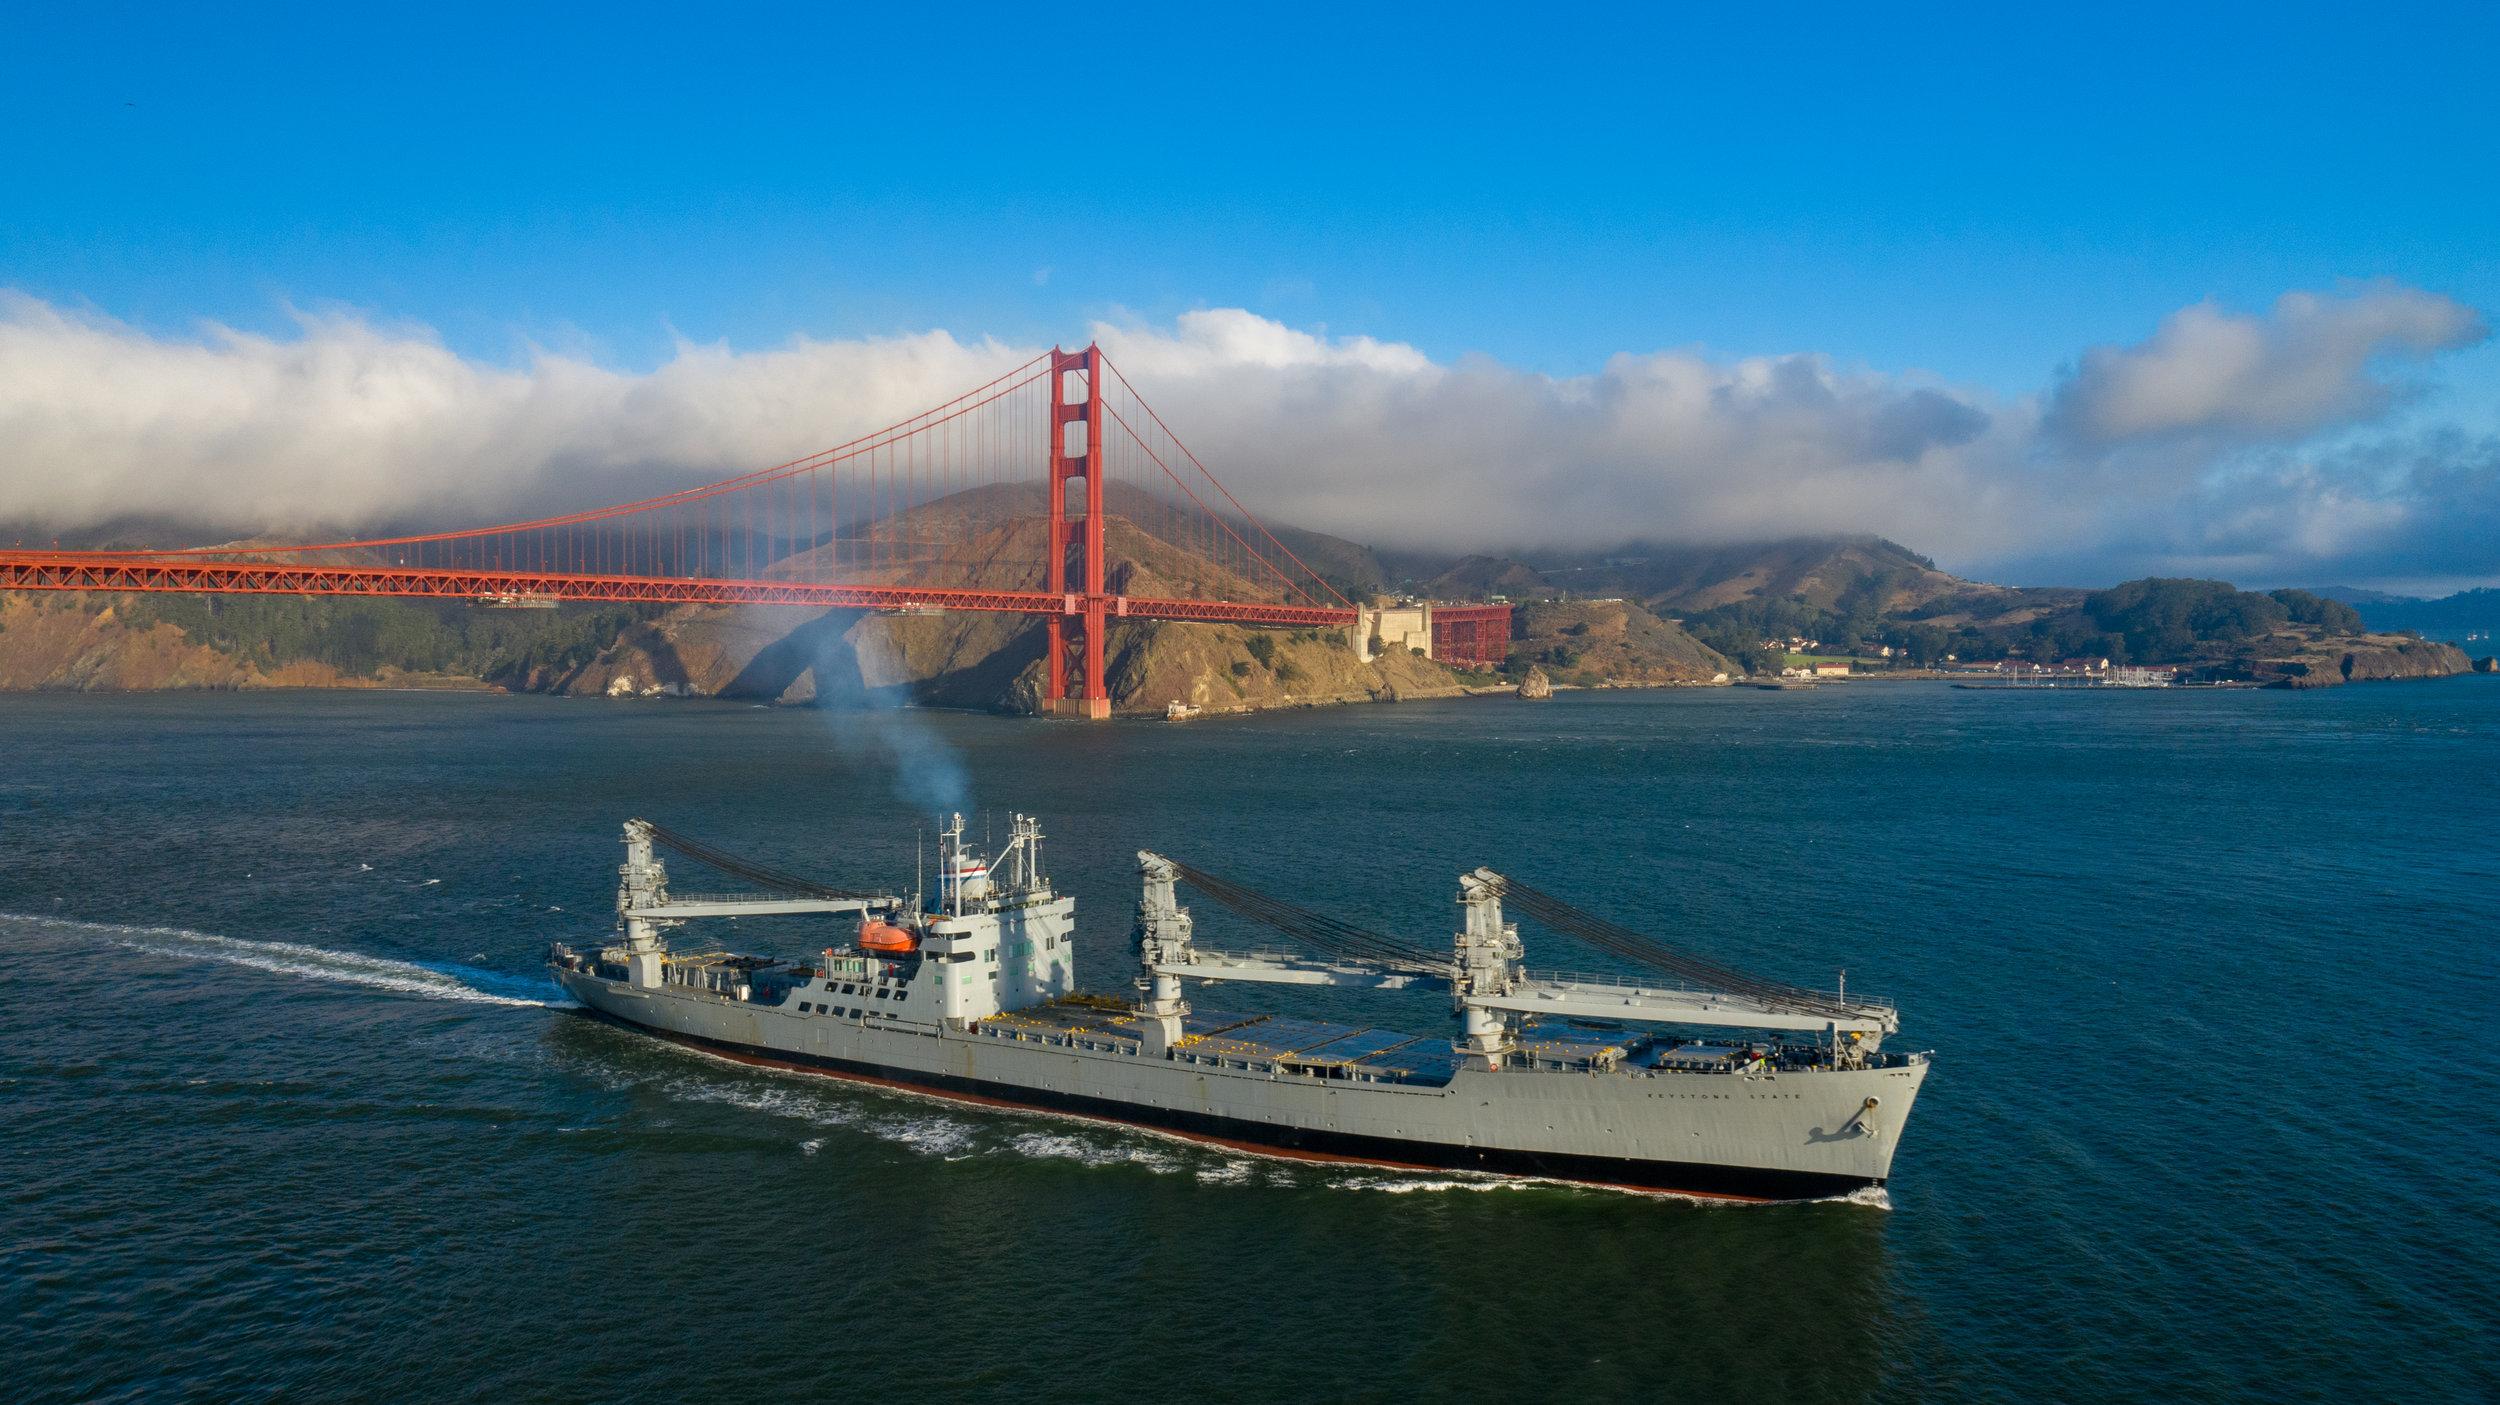 Aerial photography of ships at sea